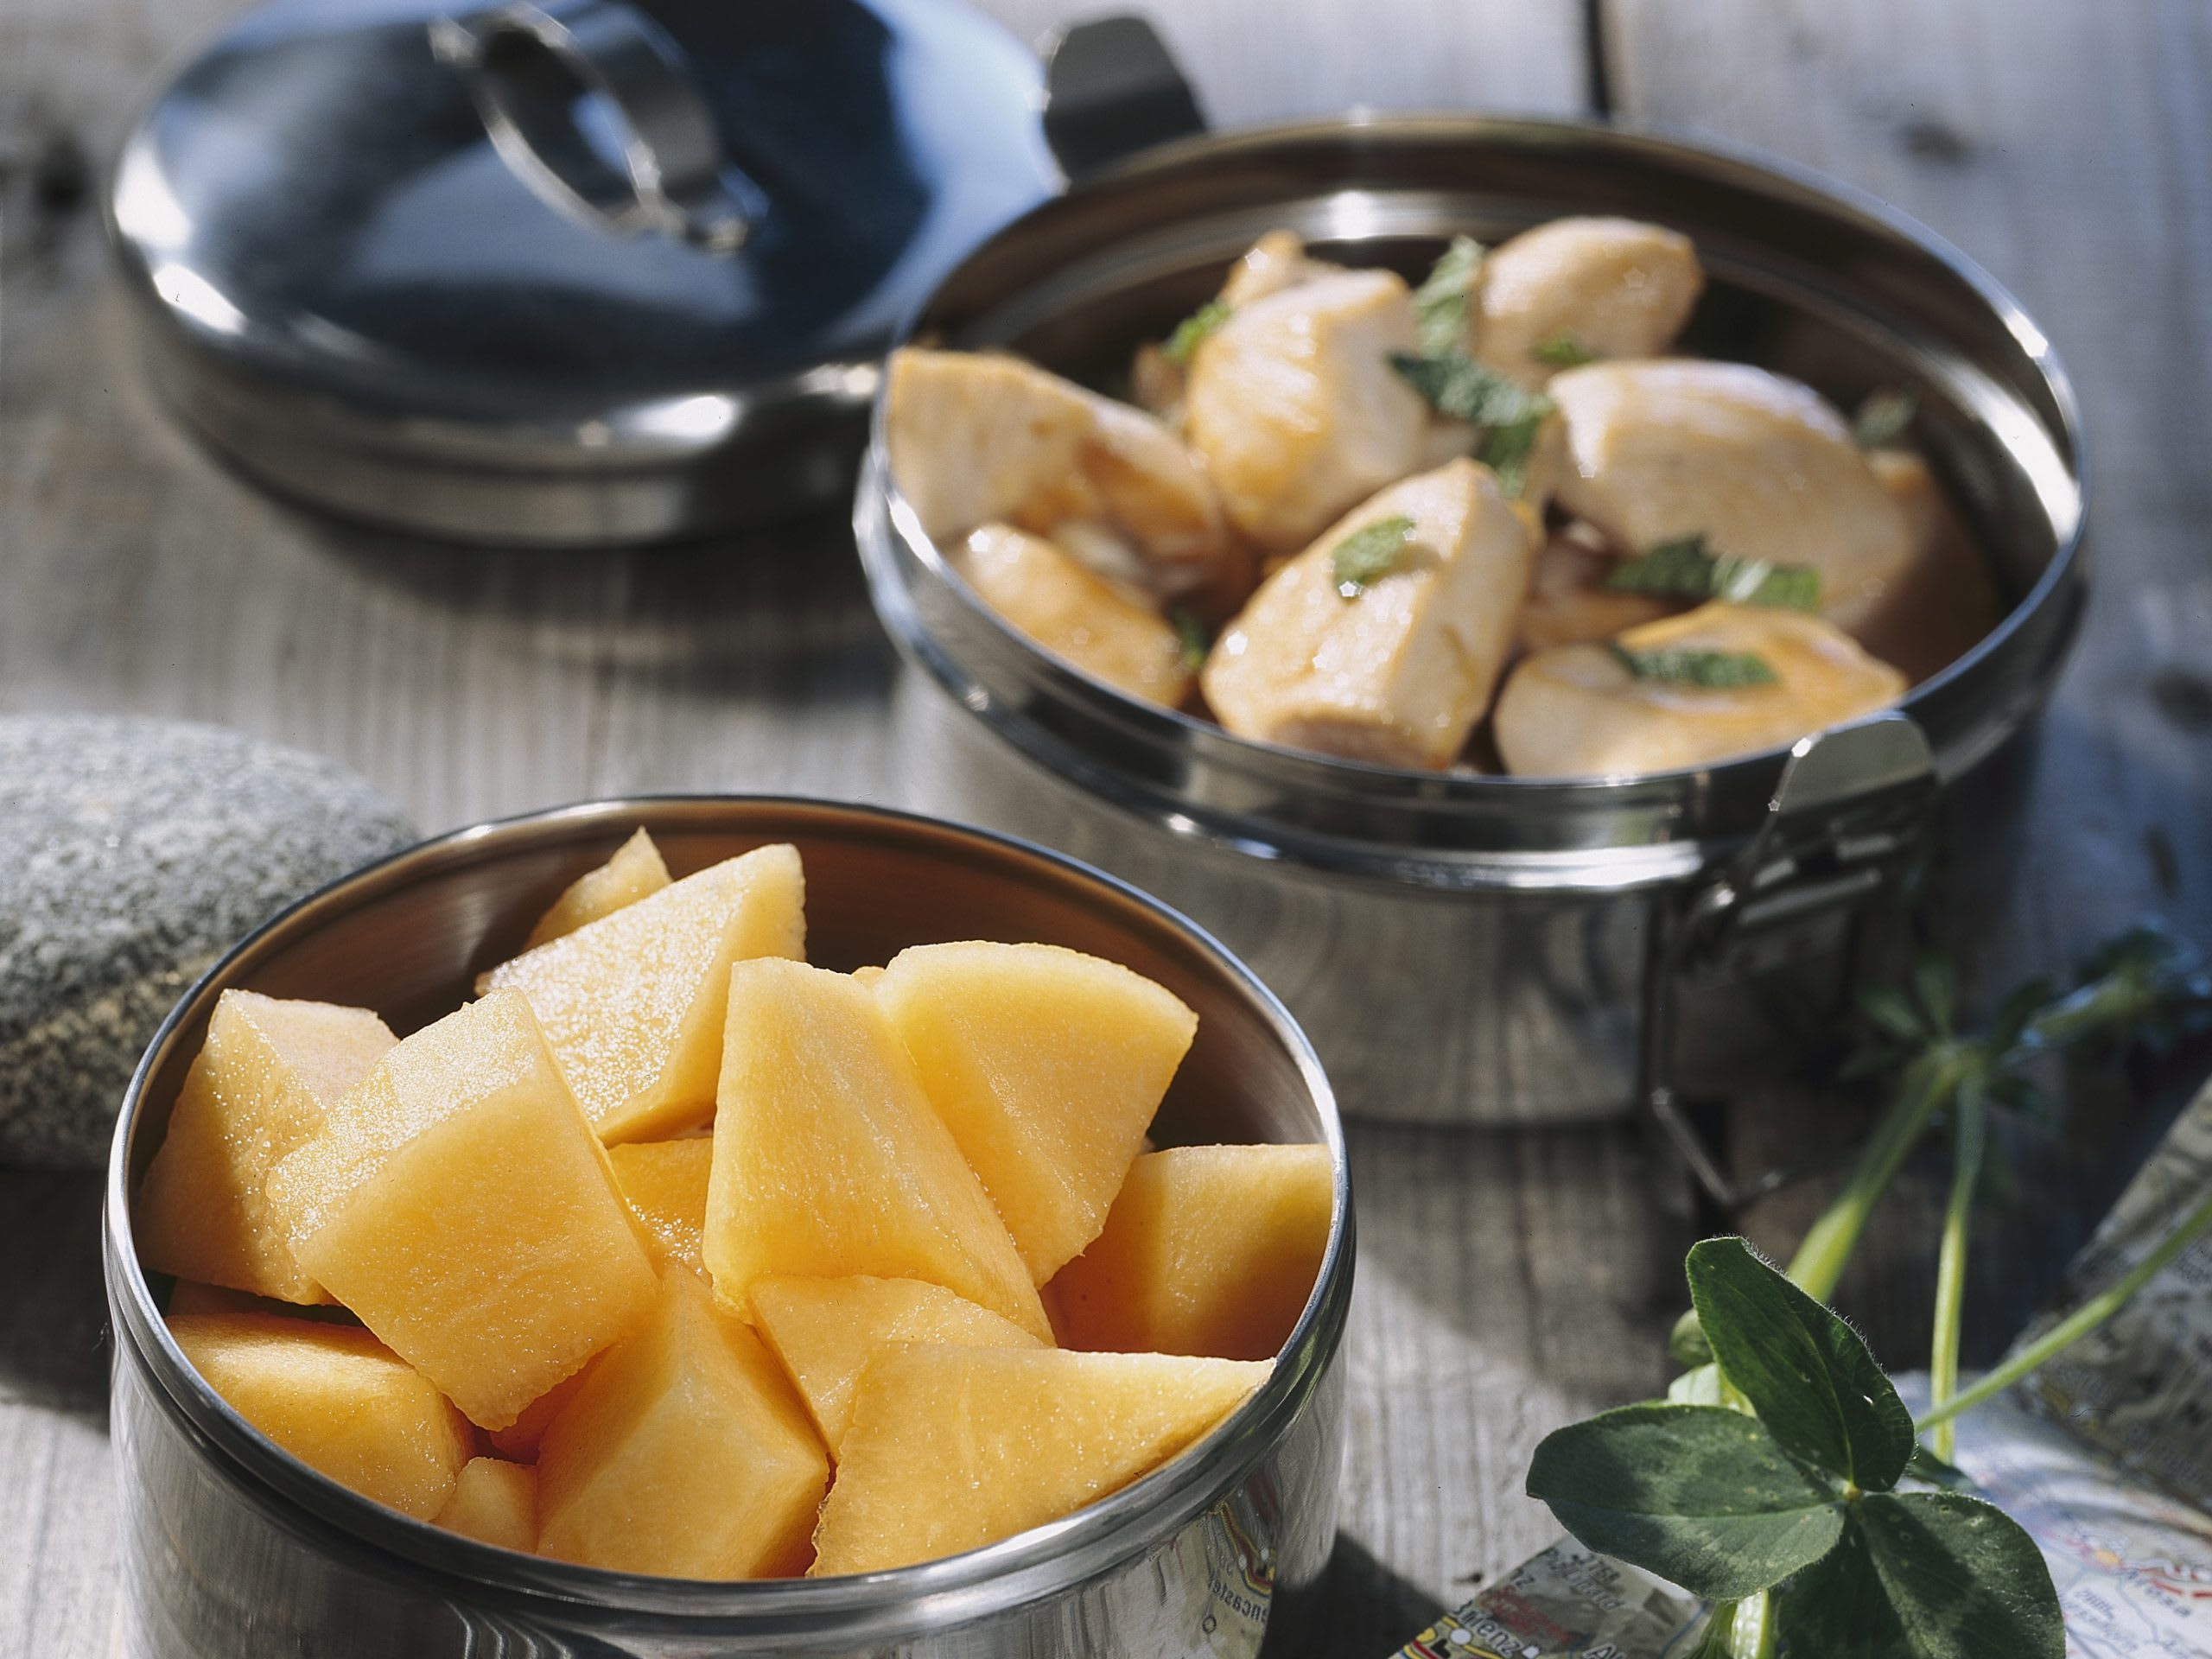 Poulet-Melonen-Salat